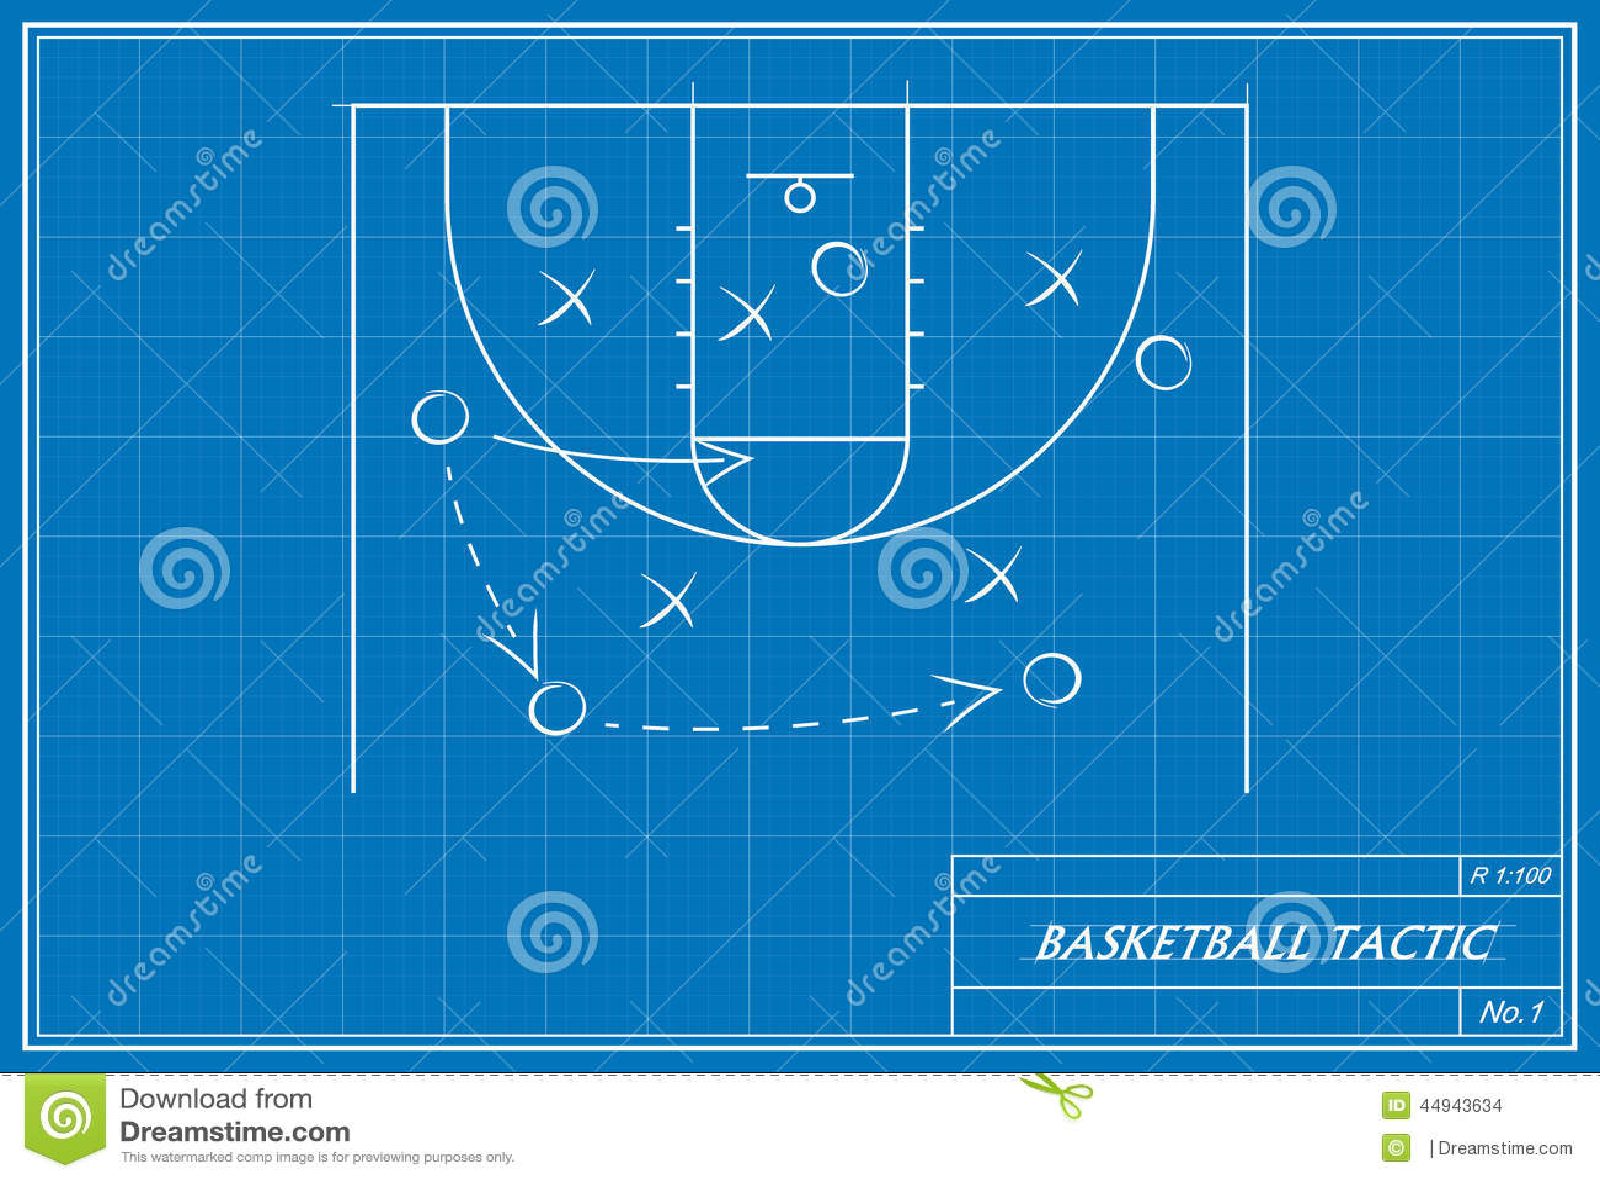 Basketball tactic on blueprint stock illustration illustration of download comp malvernweather Choice Image